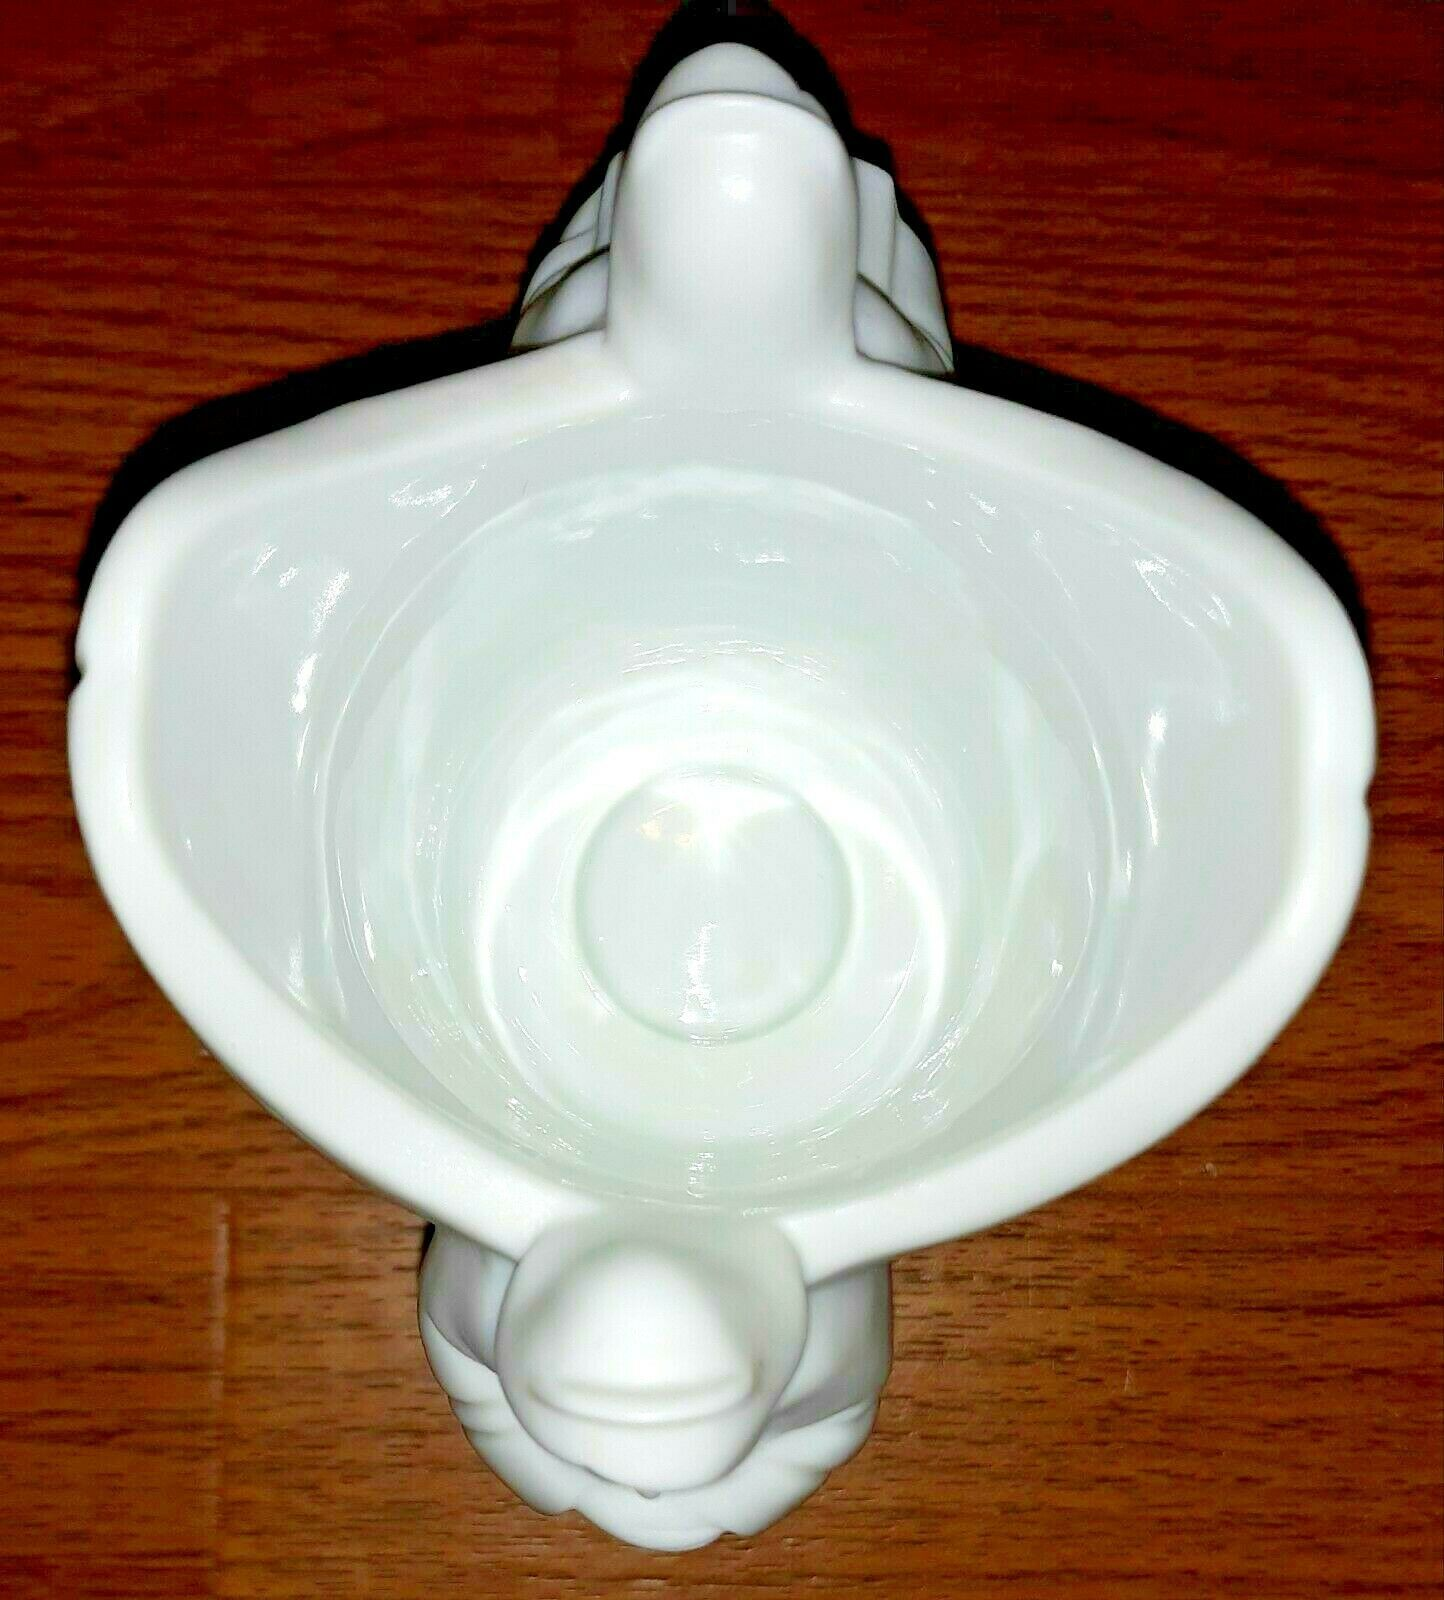 "Angel Candleholder "" AVON "" Collection Porcelain White 5"" High 4"" Long Catholic - $9.75"